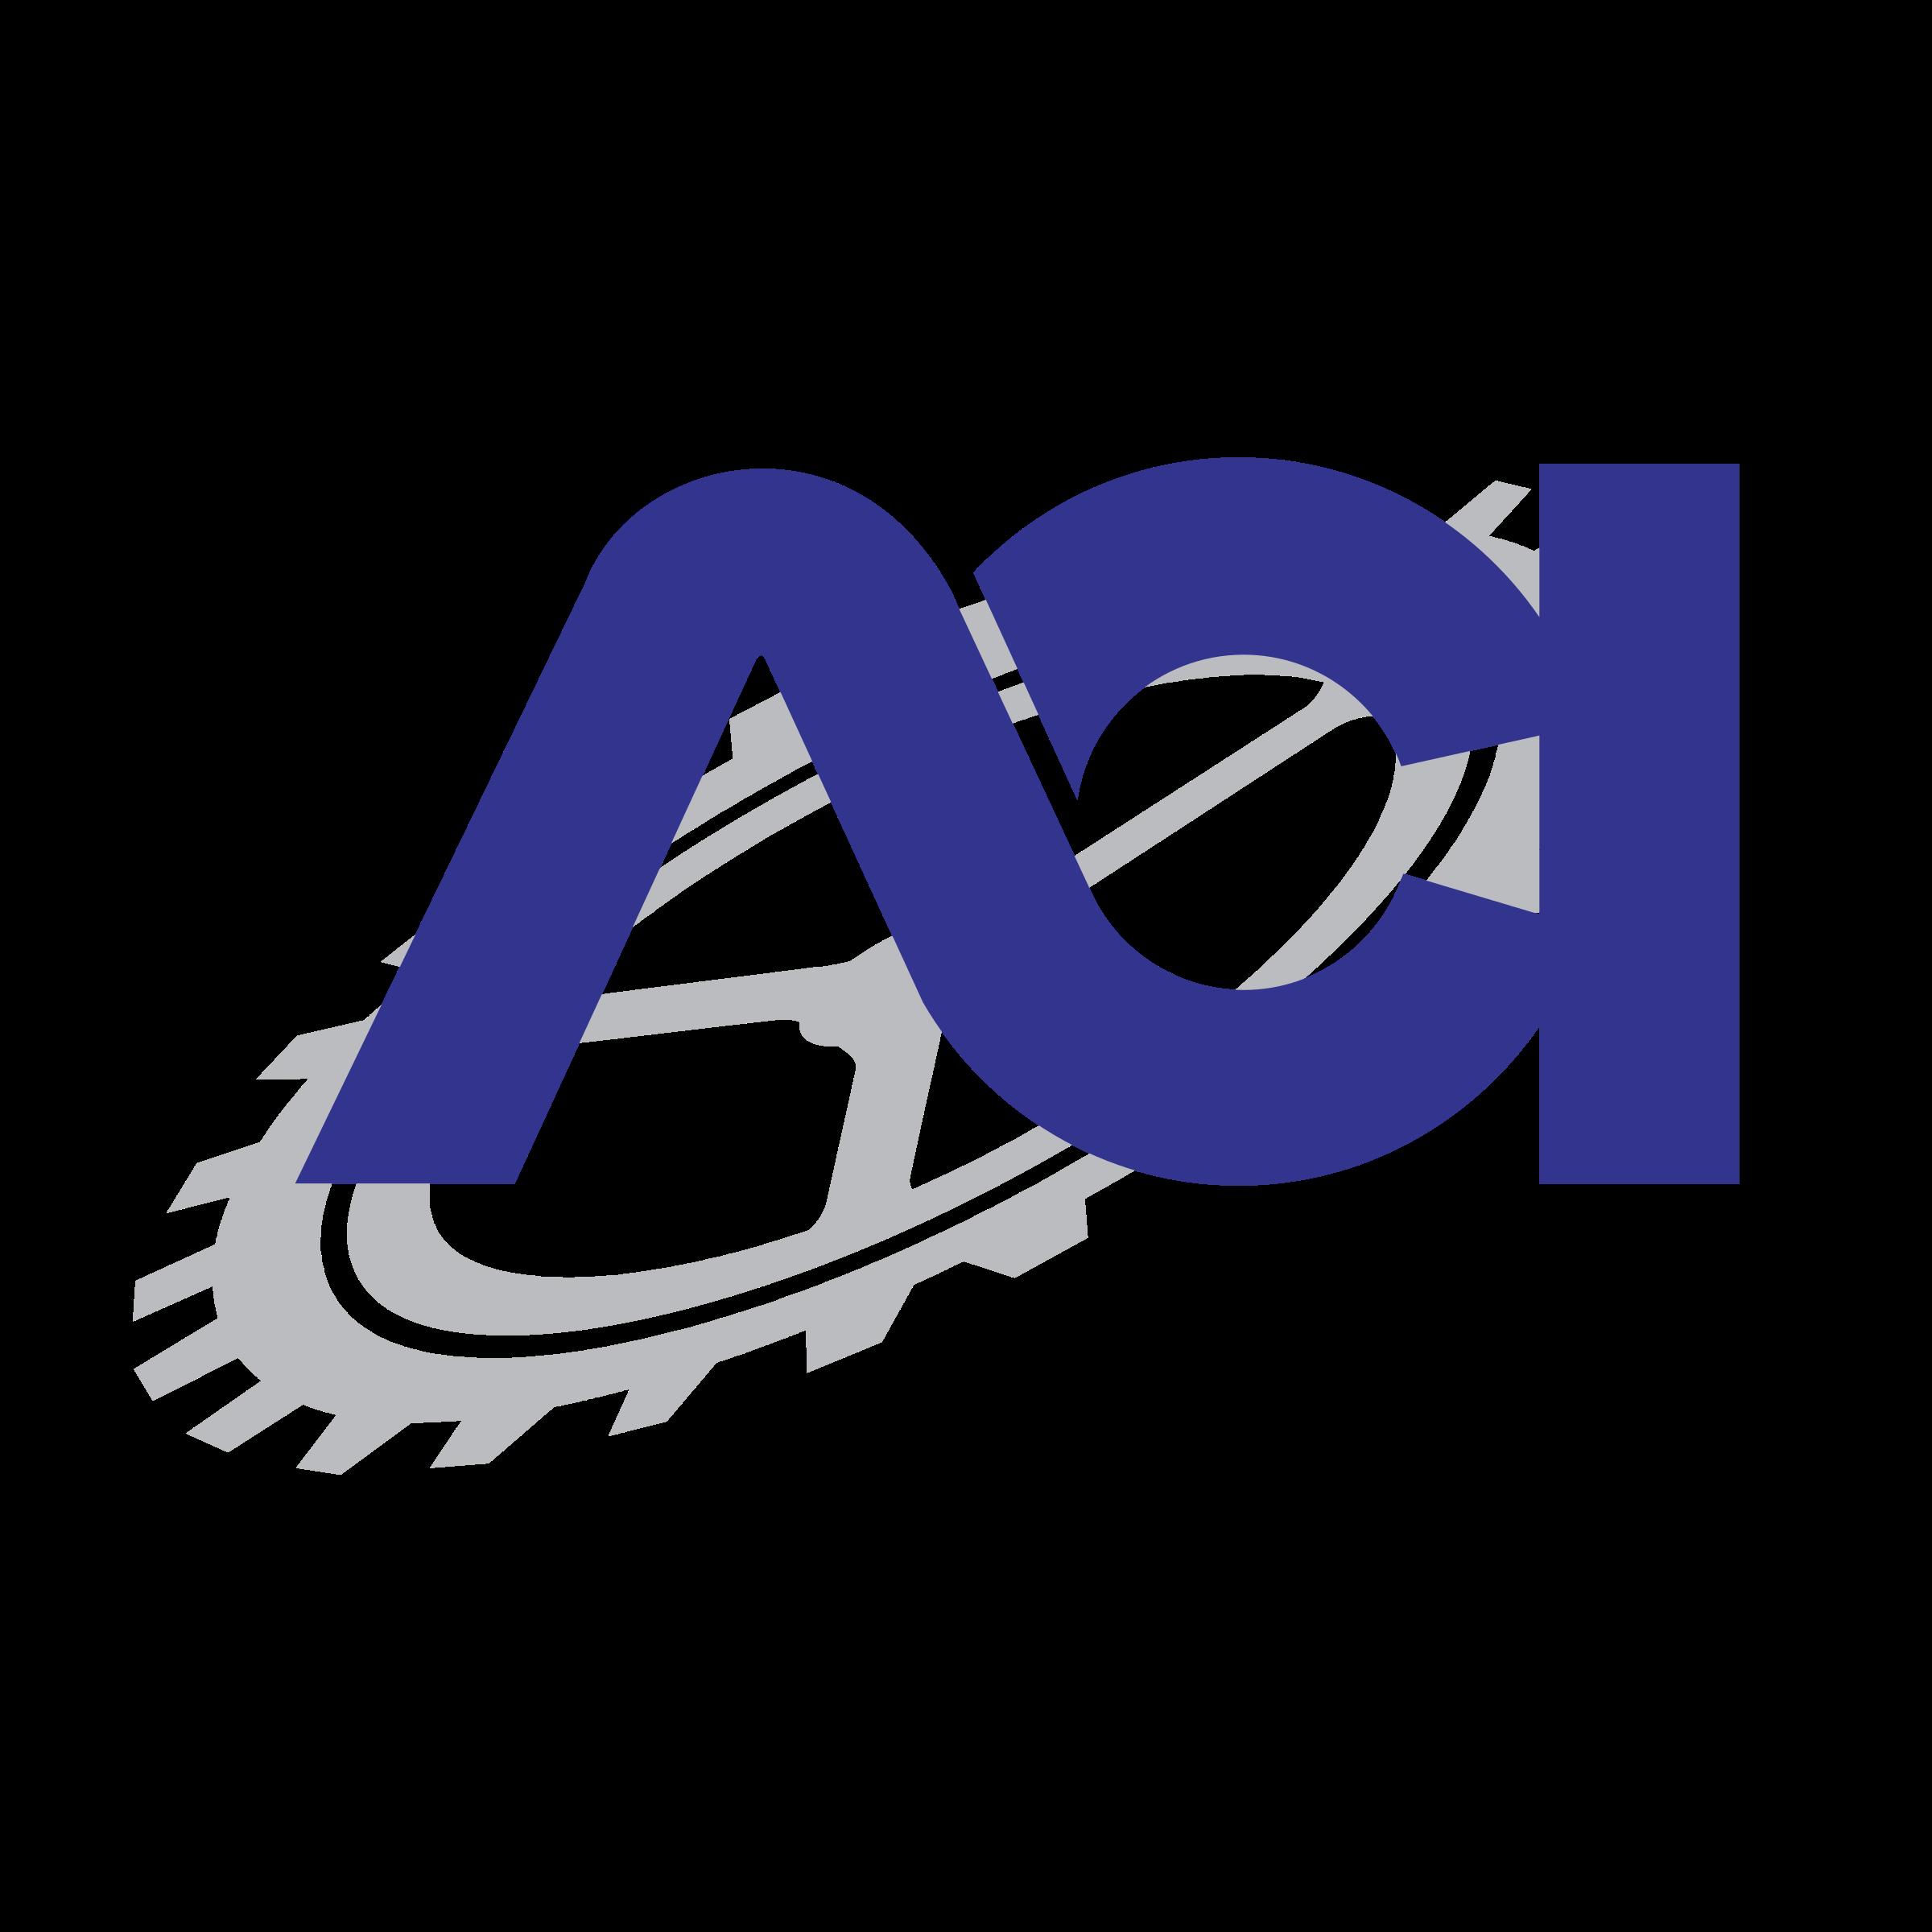 ACI Logo PNG Transparent & SVG Vector.